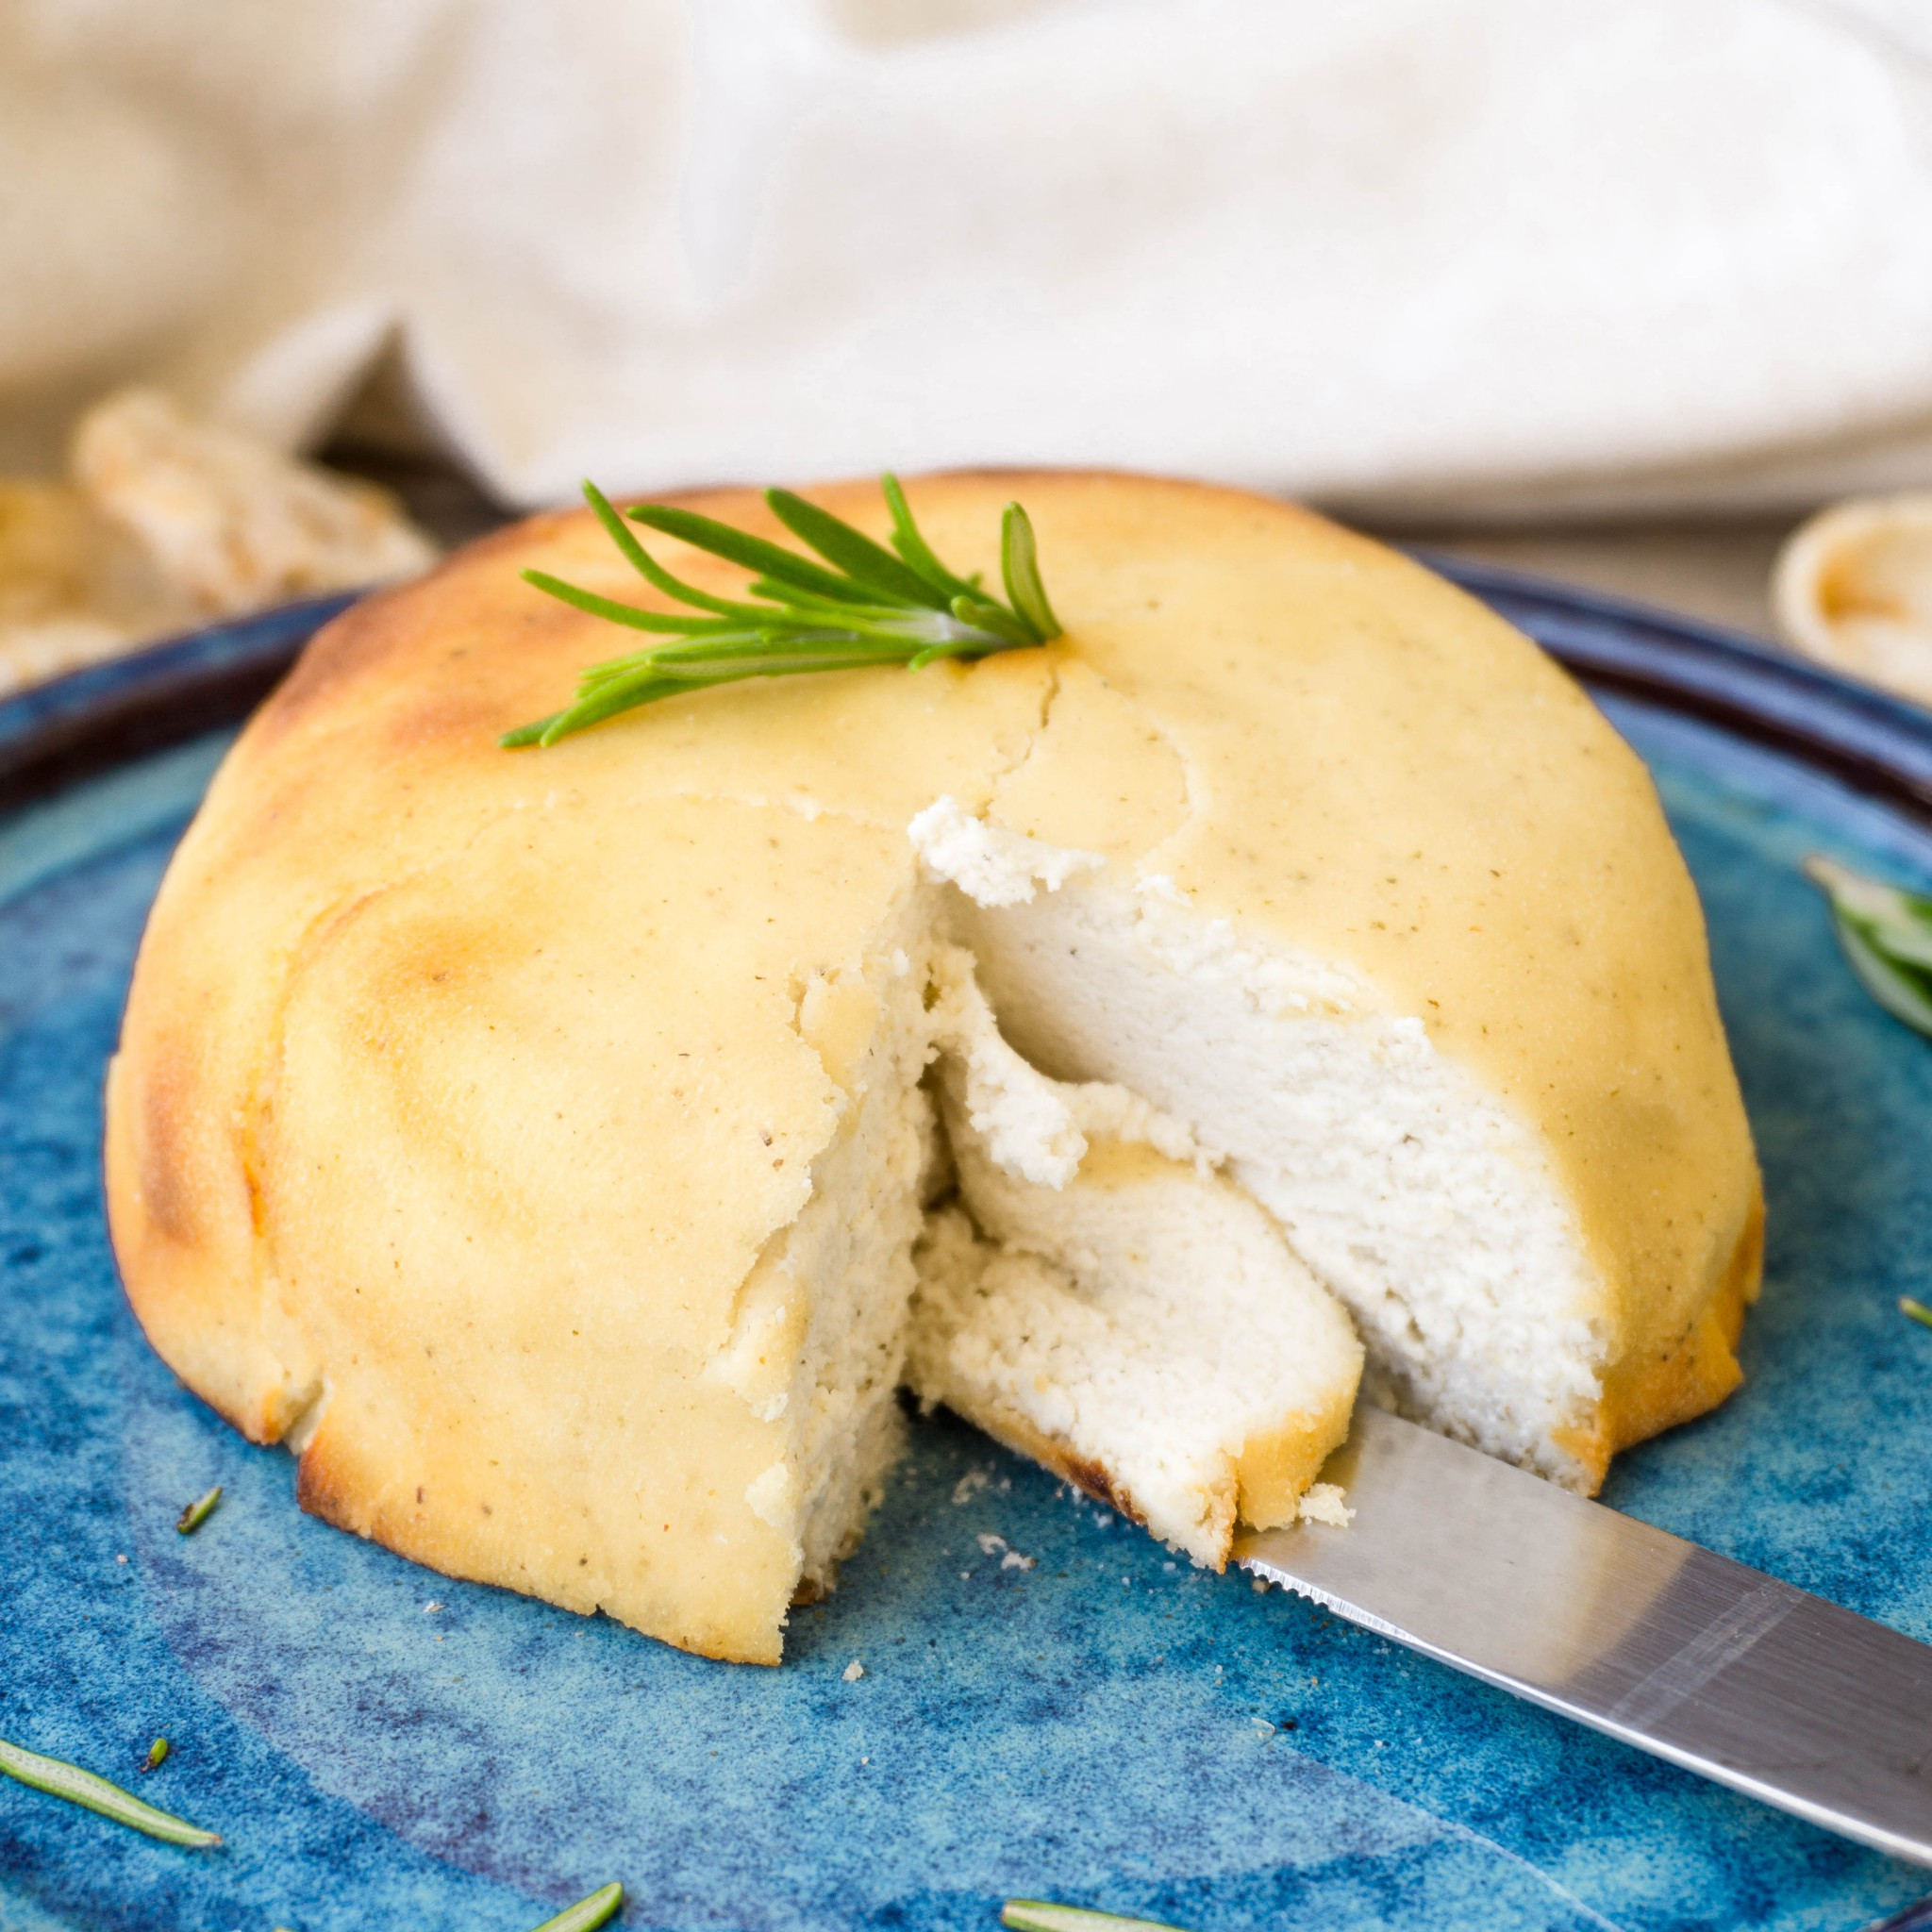 Vegan keto baked macadamia feta